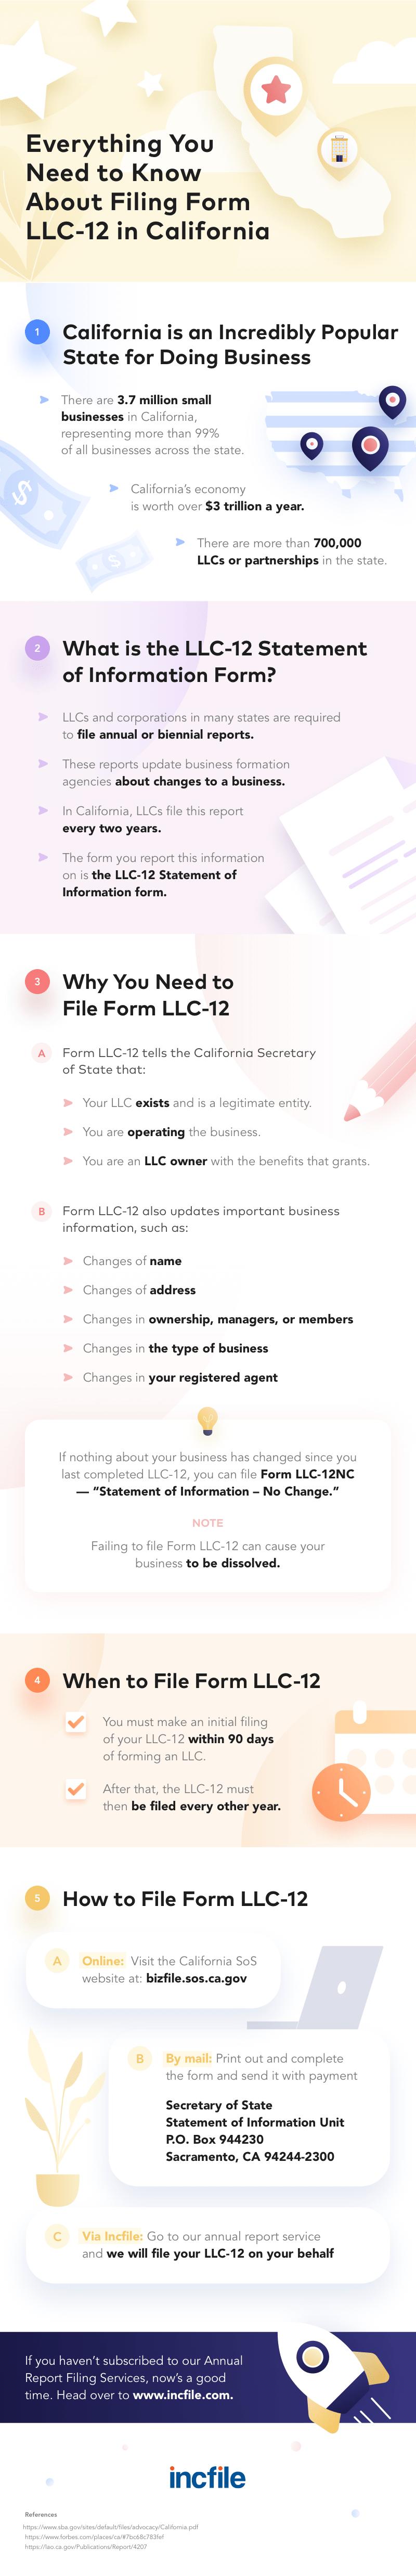 California Form LLC12 Infographic